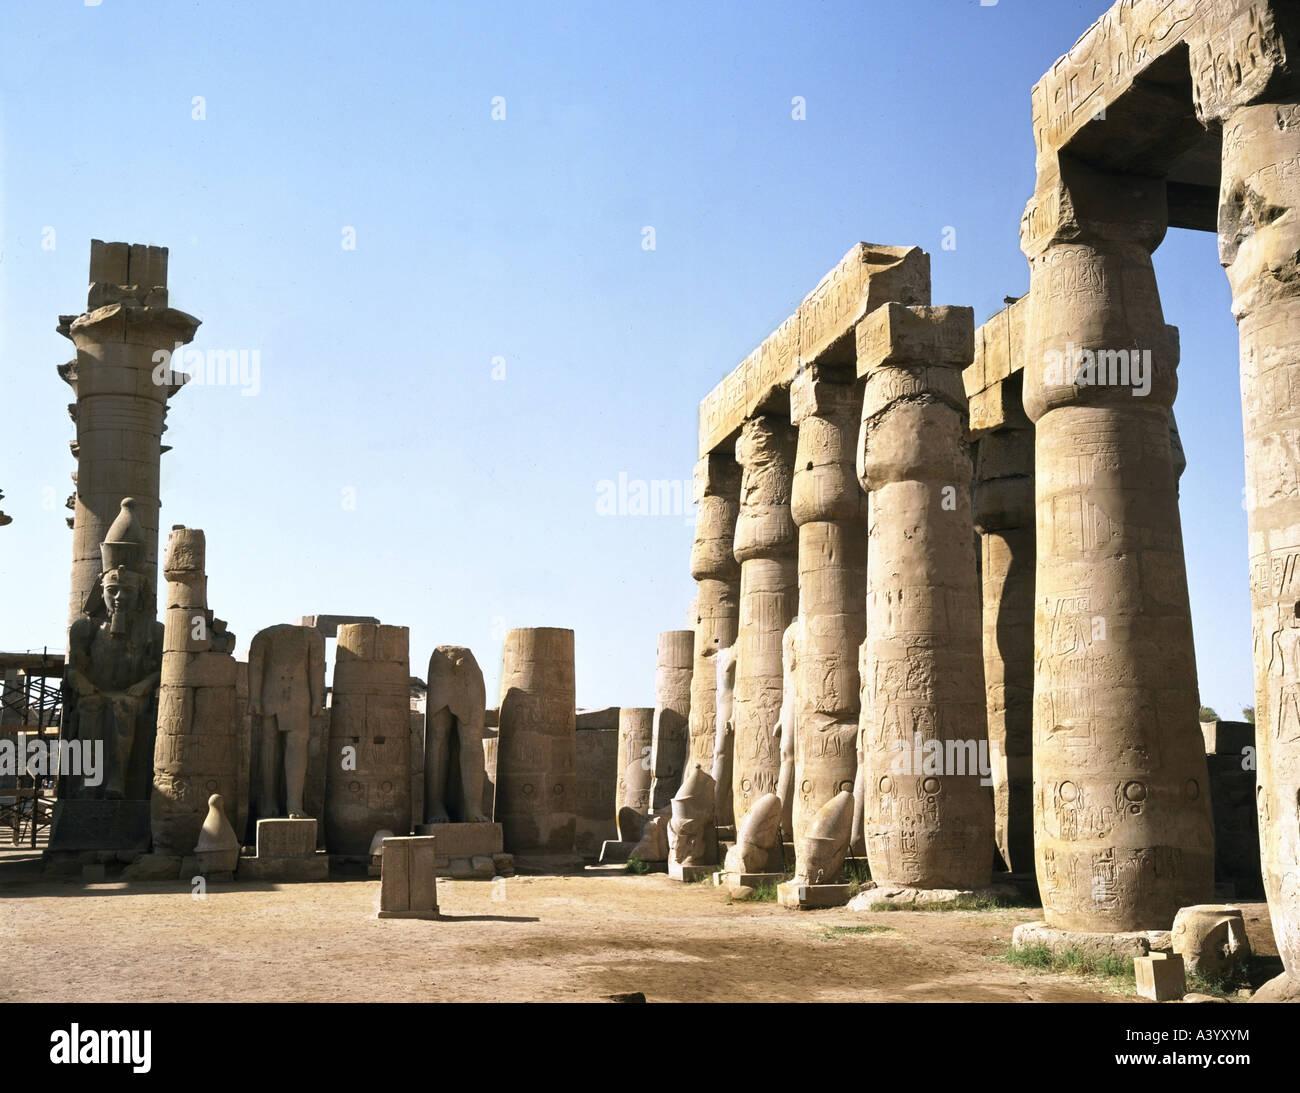 Travel Geography: Amenhotep Son Of Hapu Stock Photos & Amenhotep Son Of Hapu